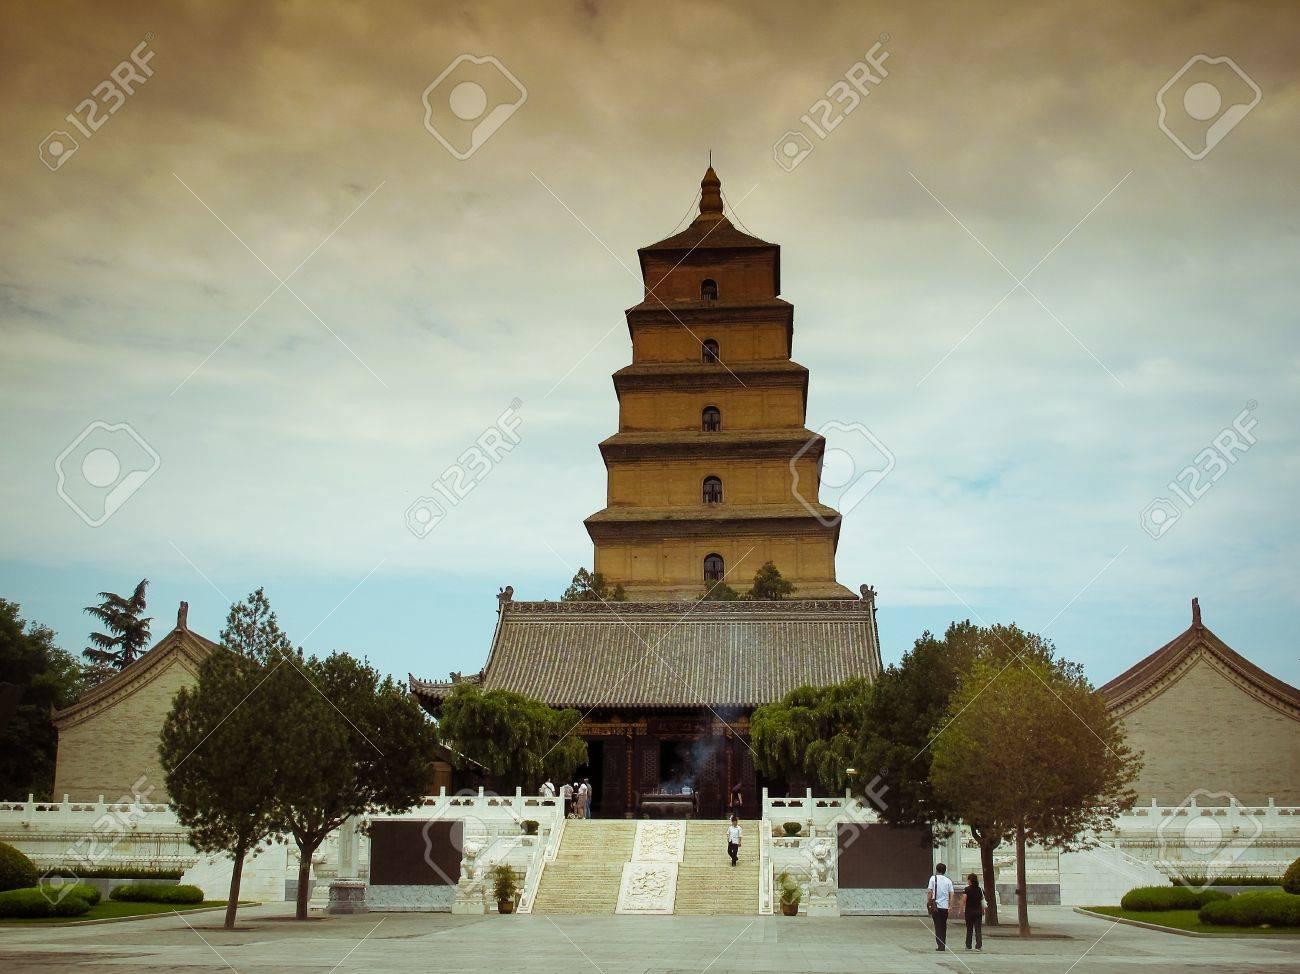 Giant Wild Goose Pagoda - Buddhist pagoda in Xian, China. - 9509682